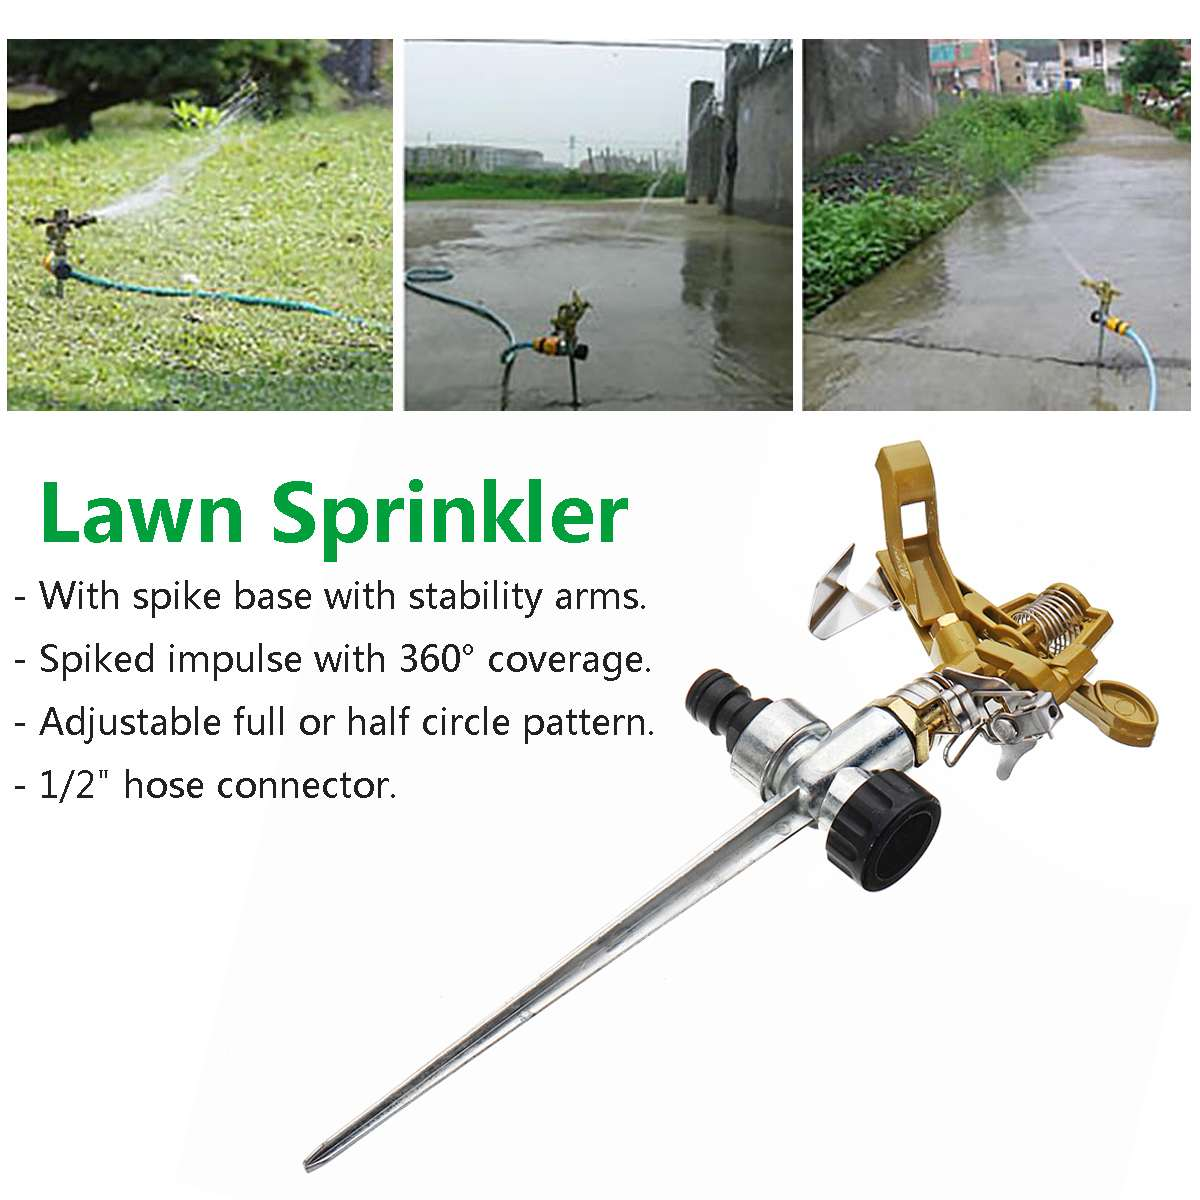 Watering & Irrigation Muciakie Garden Sprinkler On Plastic Spike Lawn Grass 360 Degree Adjustable Rotary Water Sprayer For Garden Irrigation System